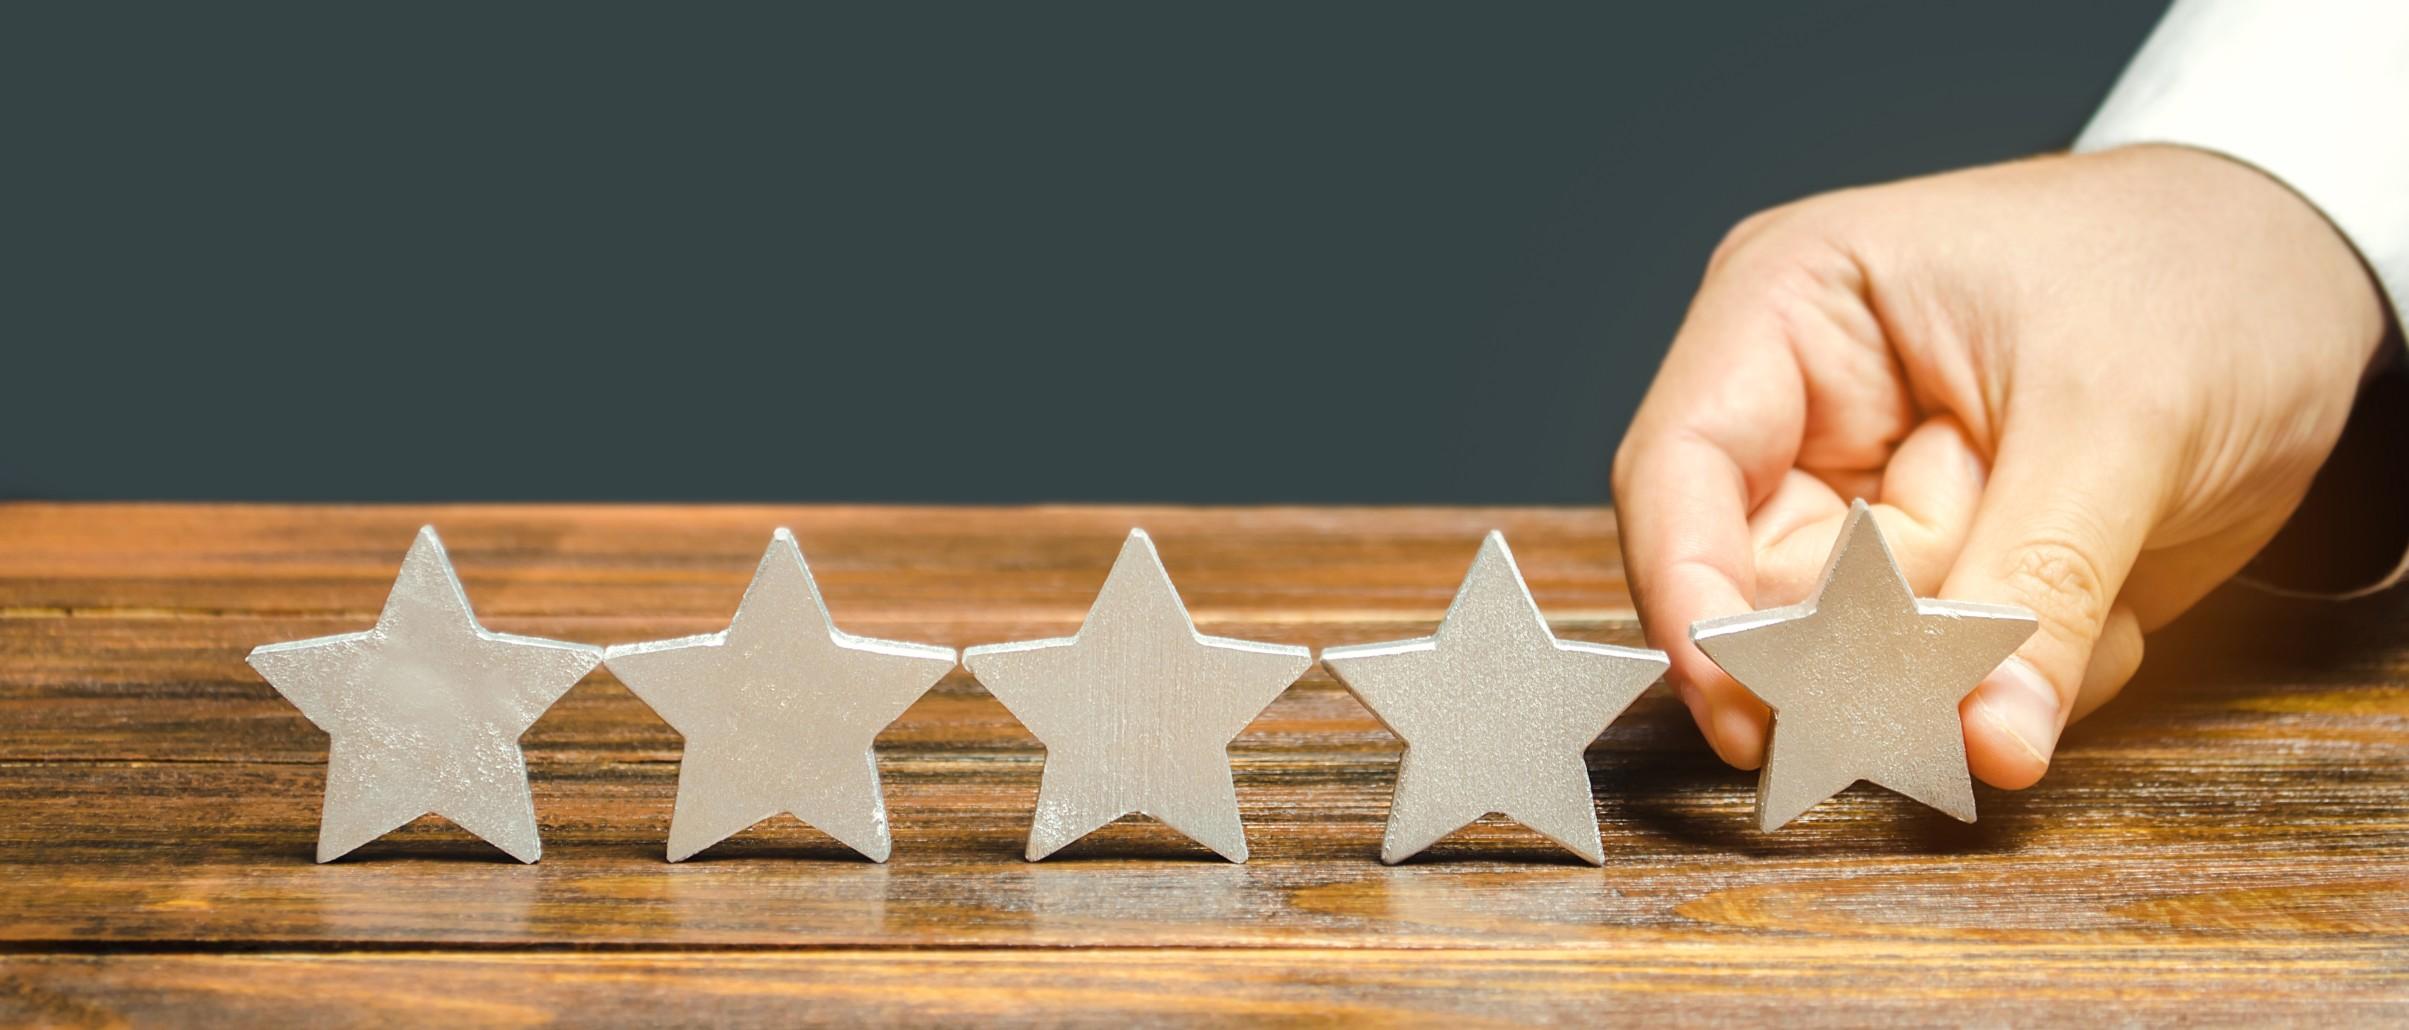 High customer ratings